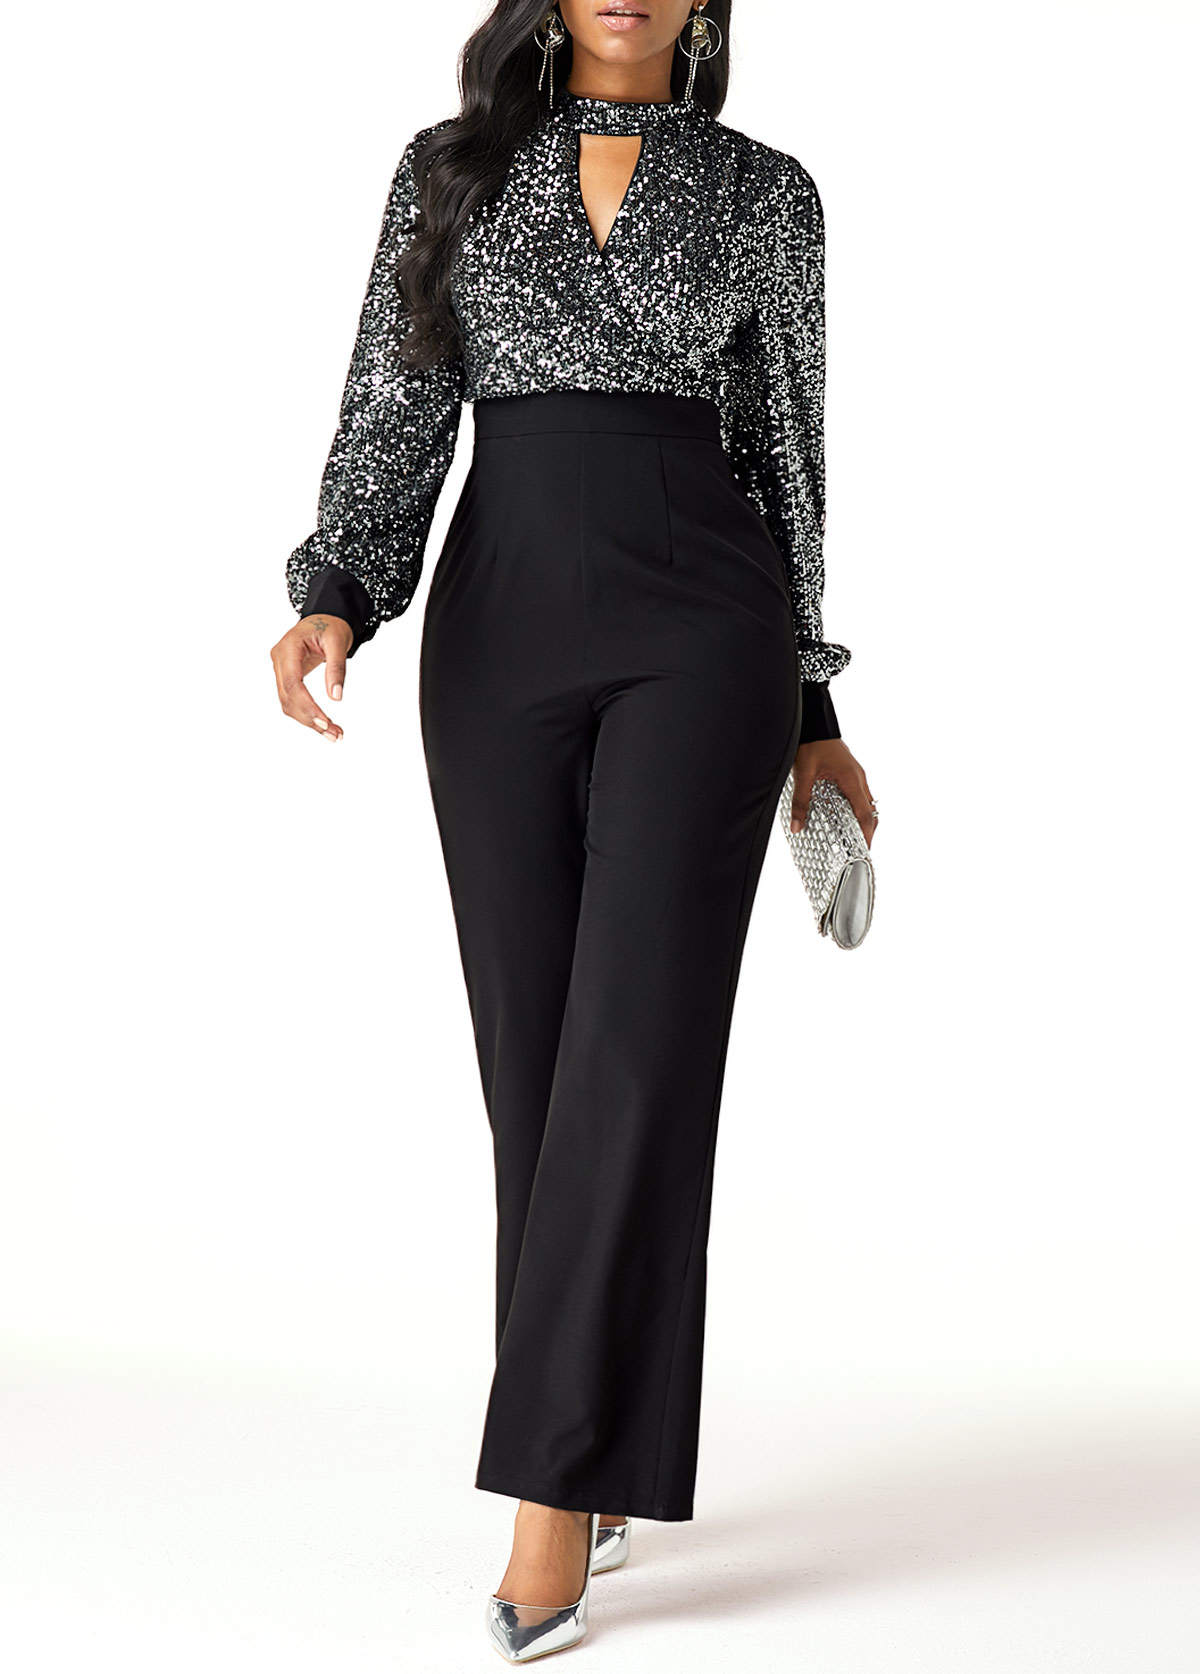 Sequin Embellished High Waist Cutout Front Jumpsuit